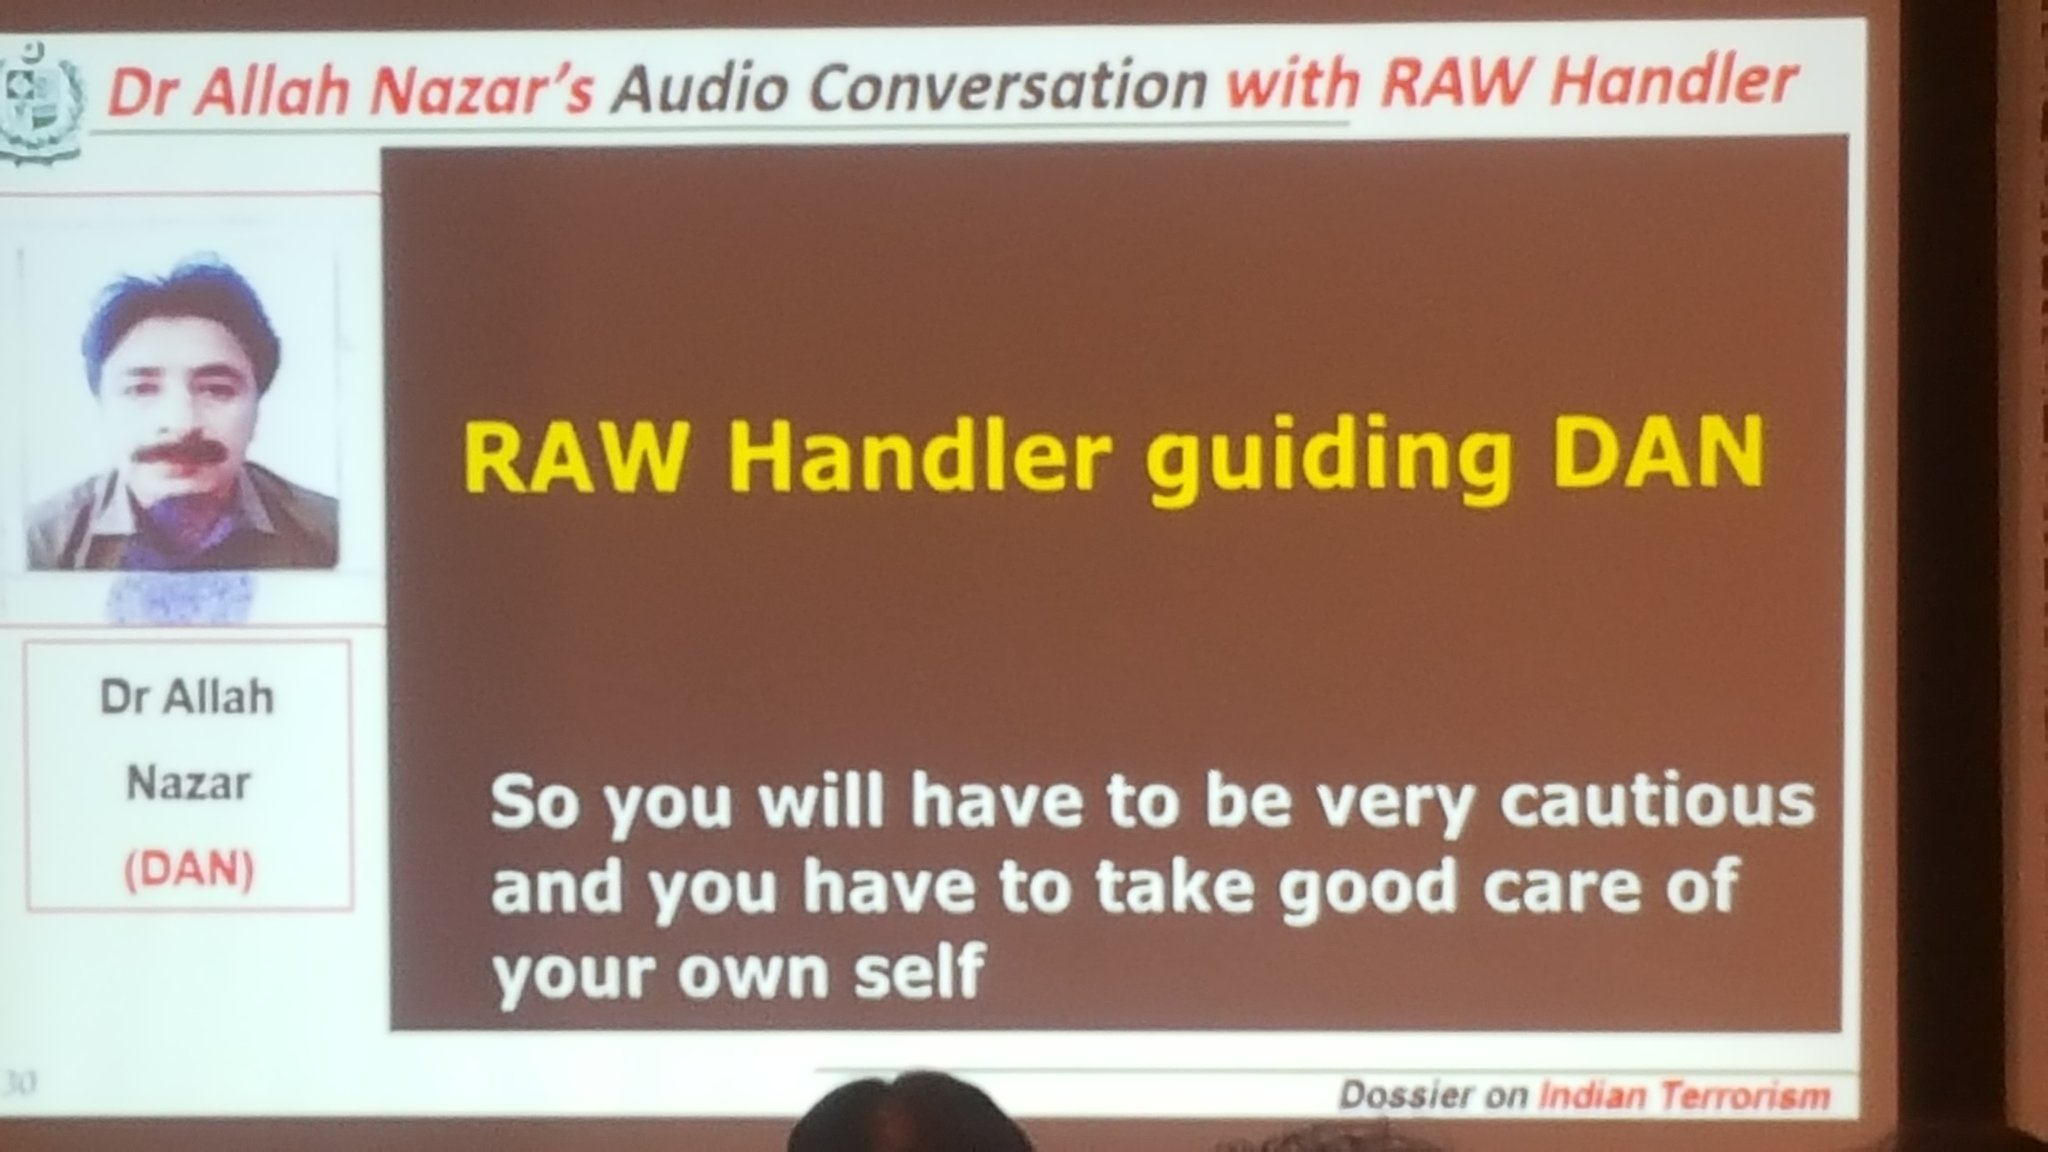 dr allah nazar audio conversation with raw handler